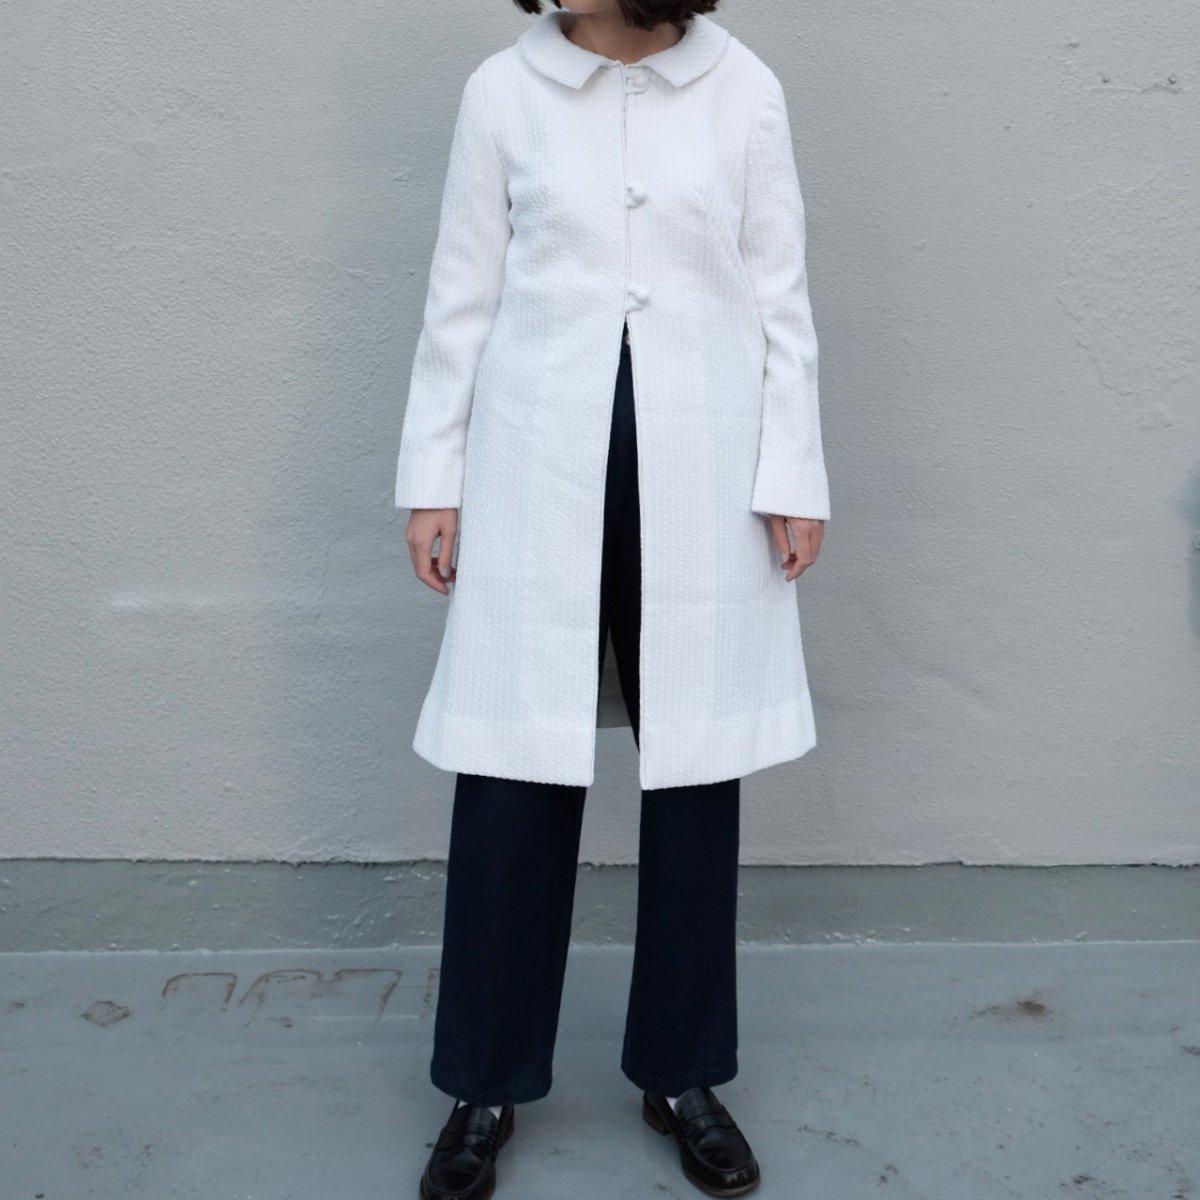 [VINTAGE] Snow white ribbed spring coat